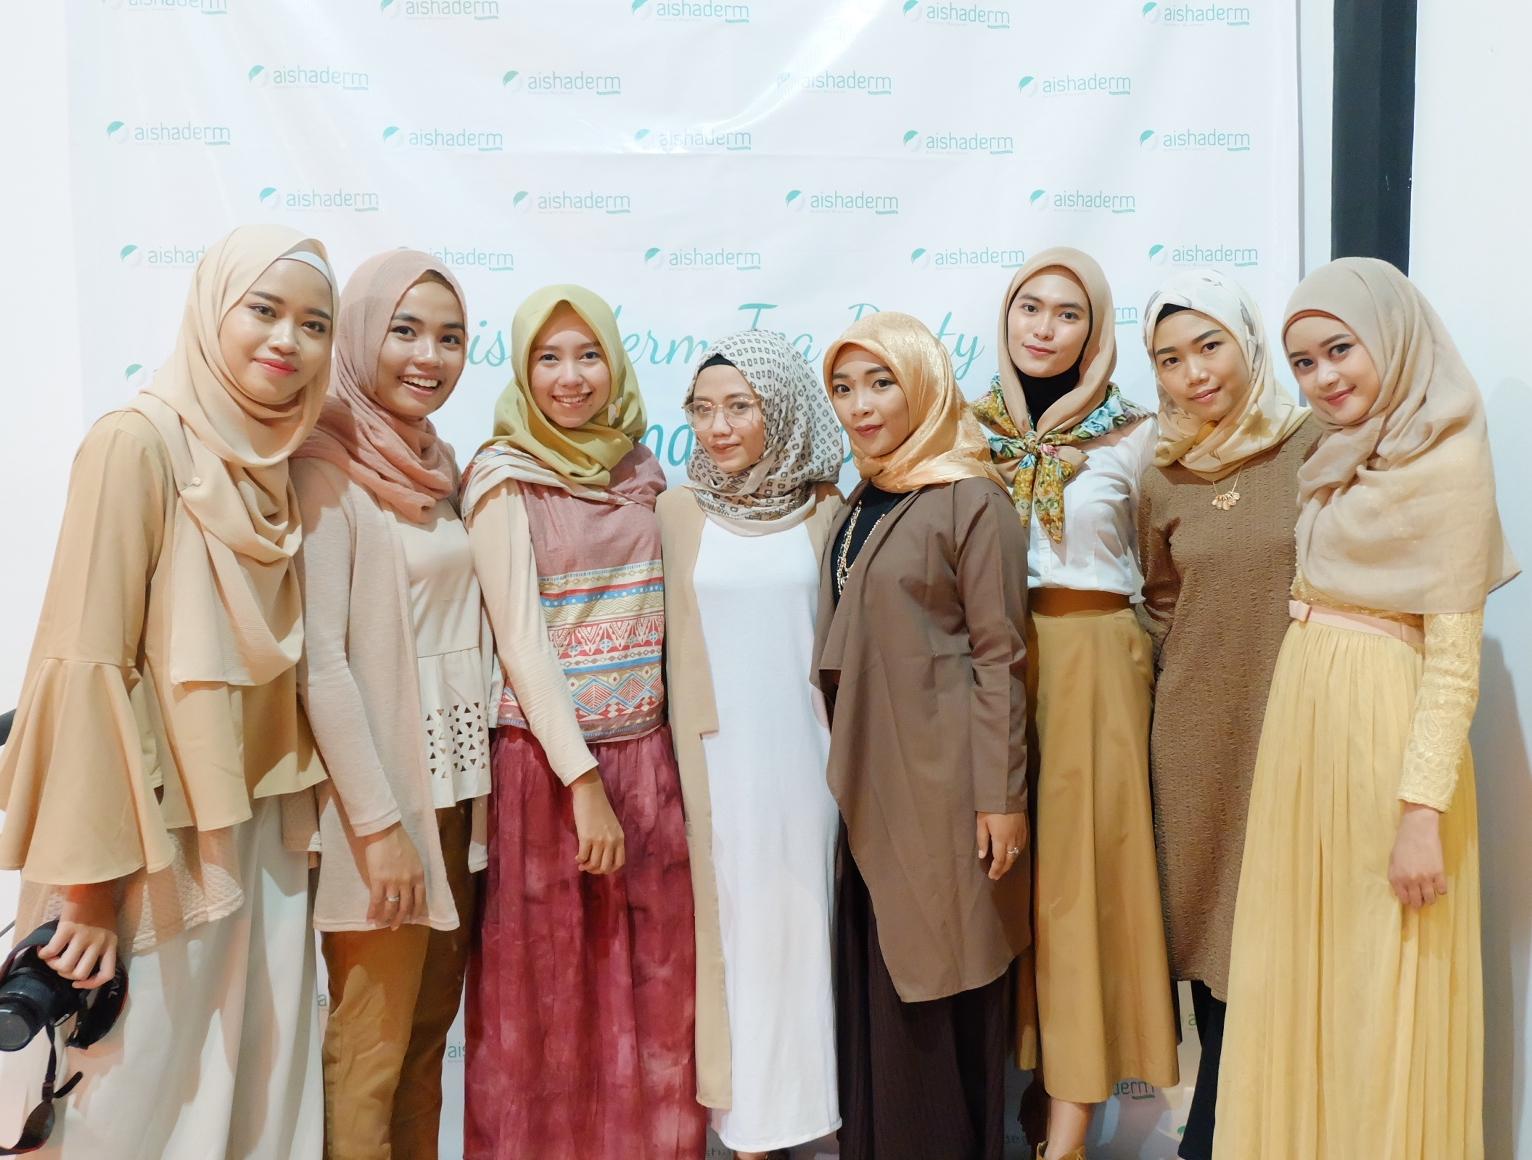 Jogja Bloggirls, Aishaderm Cosmetics